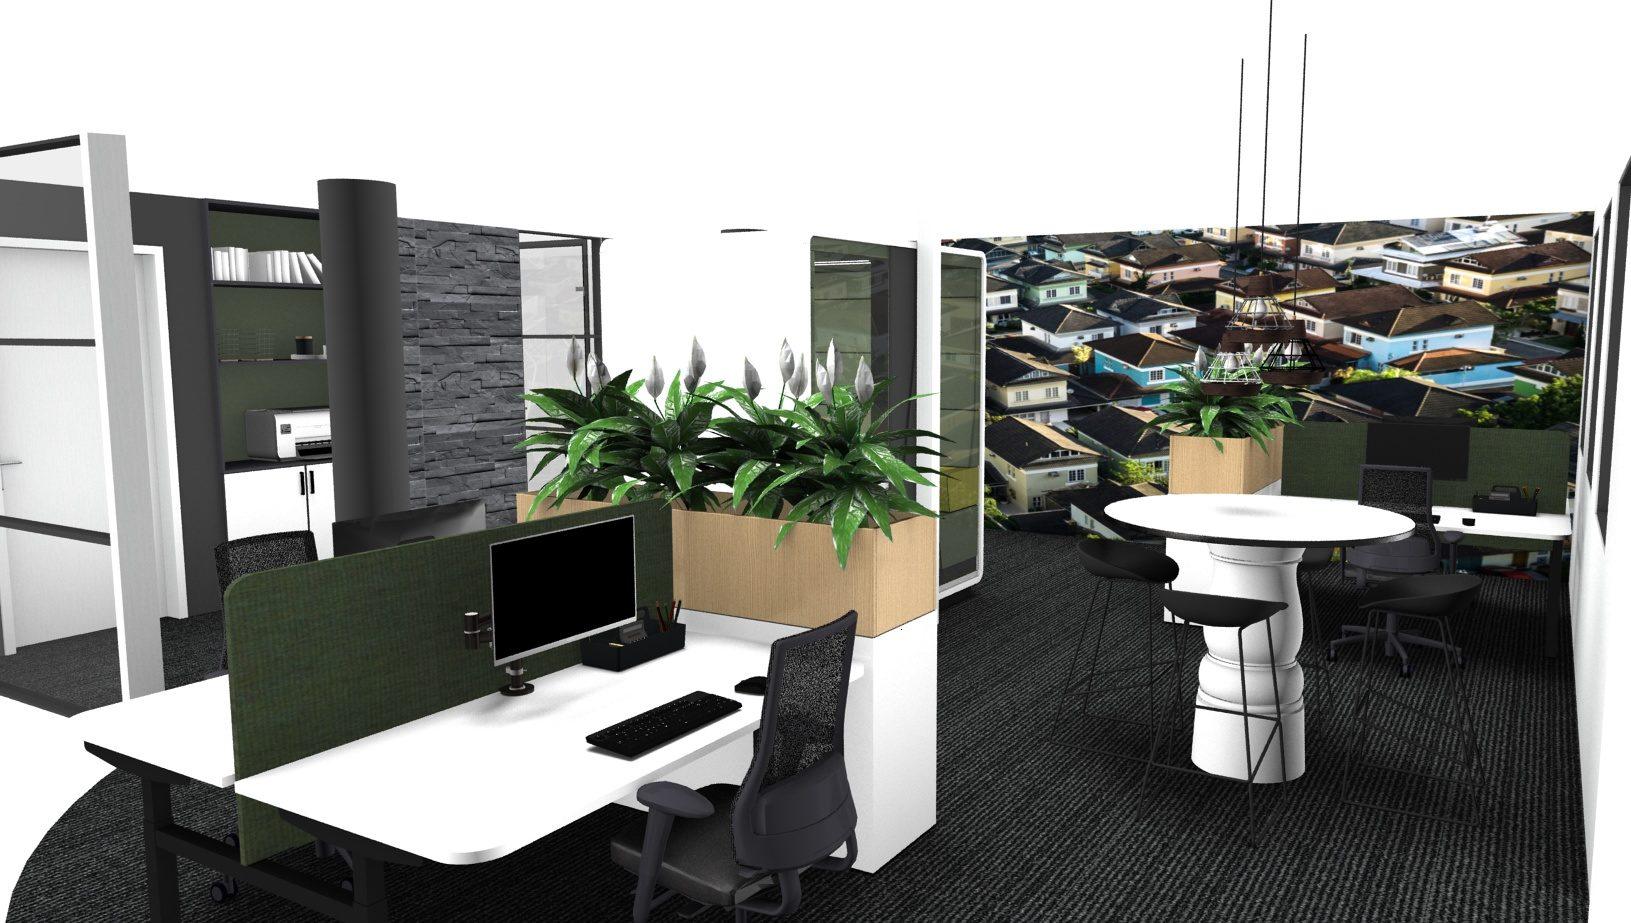 Cube_Vergadereenheid_Vergaderen_InsideOffice